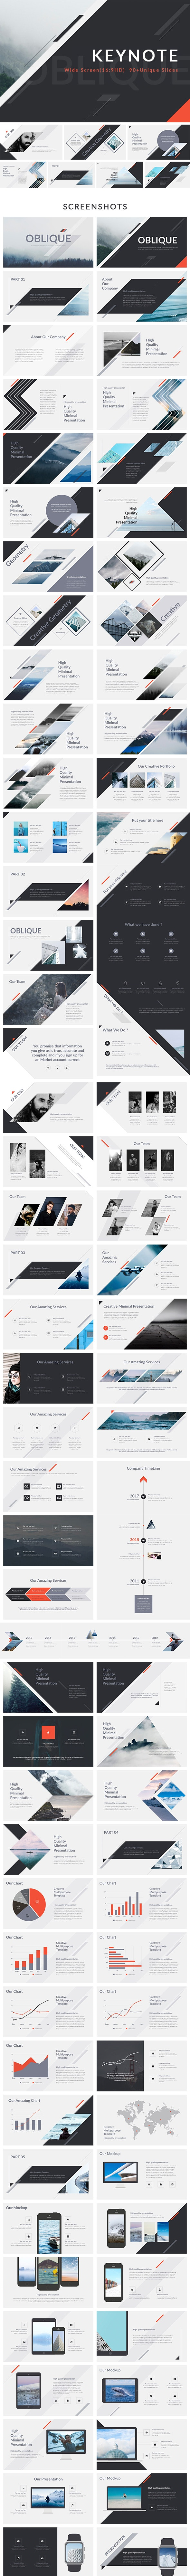 Oblique - Keynote Presentation Template - Abstract Keynote Templates